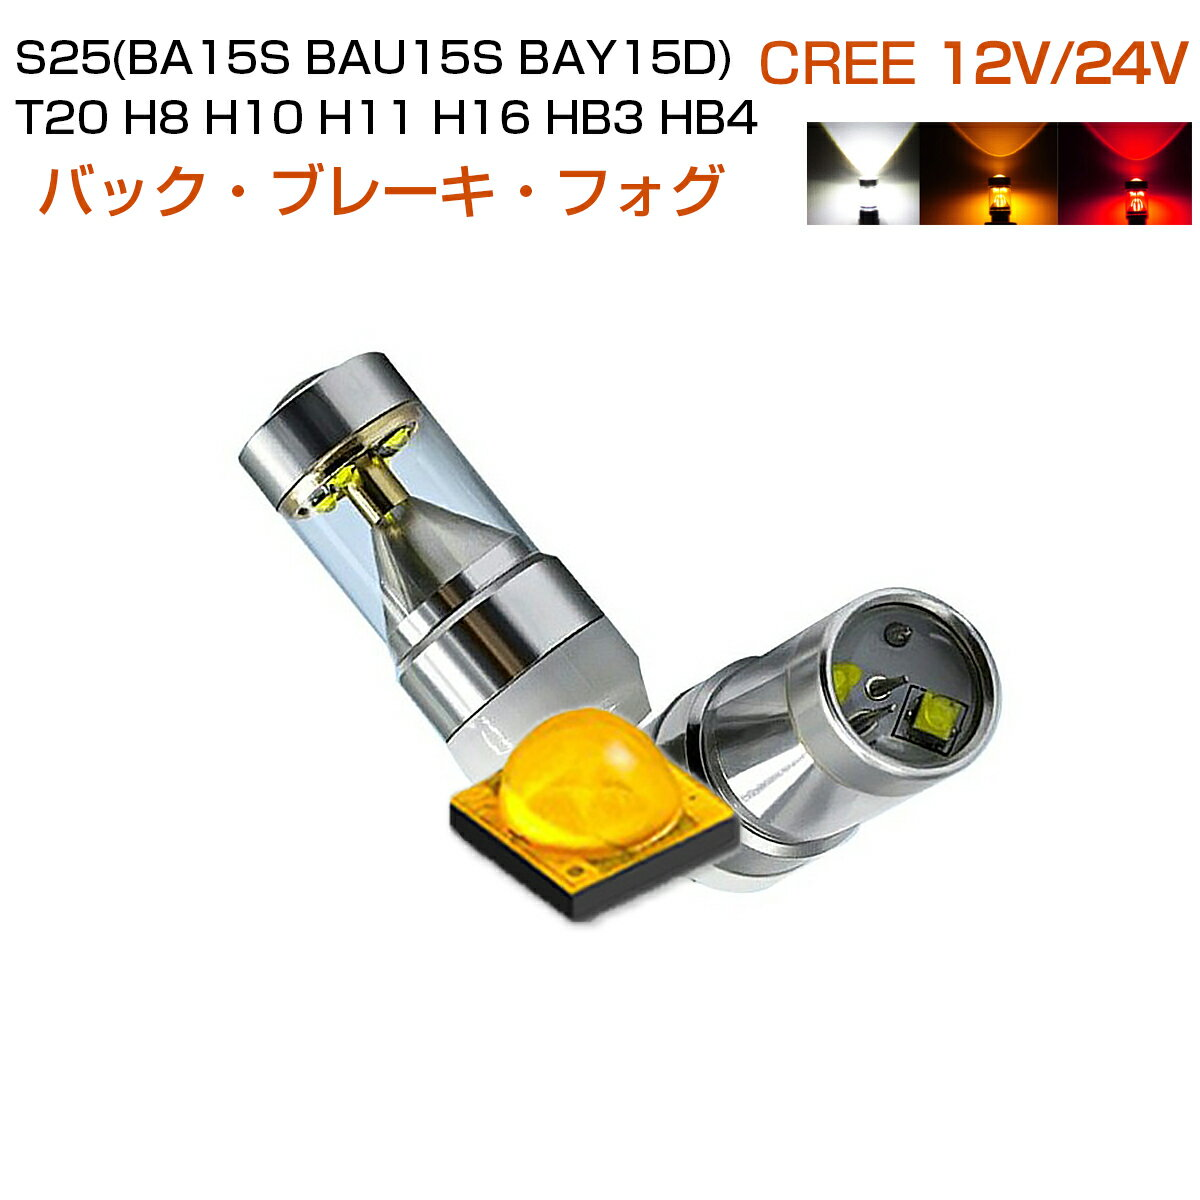 LED T20 S25 (BA15S BAU15S BAY15D) H8 H9 H10 H11 H16 HB3 HB4 HIR2 CREE LED 750lm フォグランプ ブレーキ ウインカー バックランプ 2個入り 12V/24V ネコポス便送料無料 6ヶ月保証 K&M